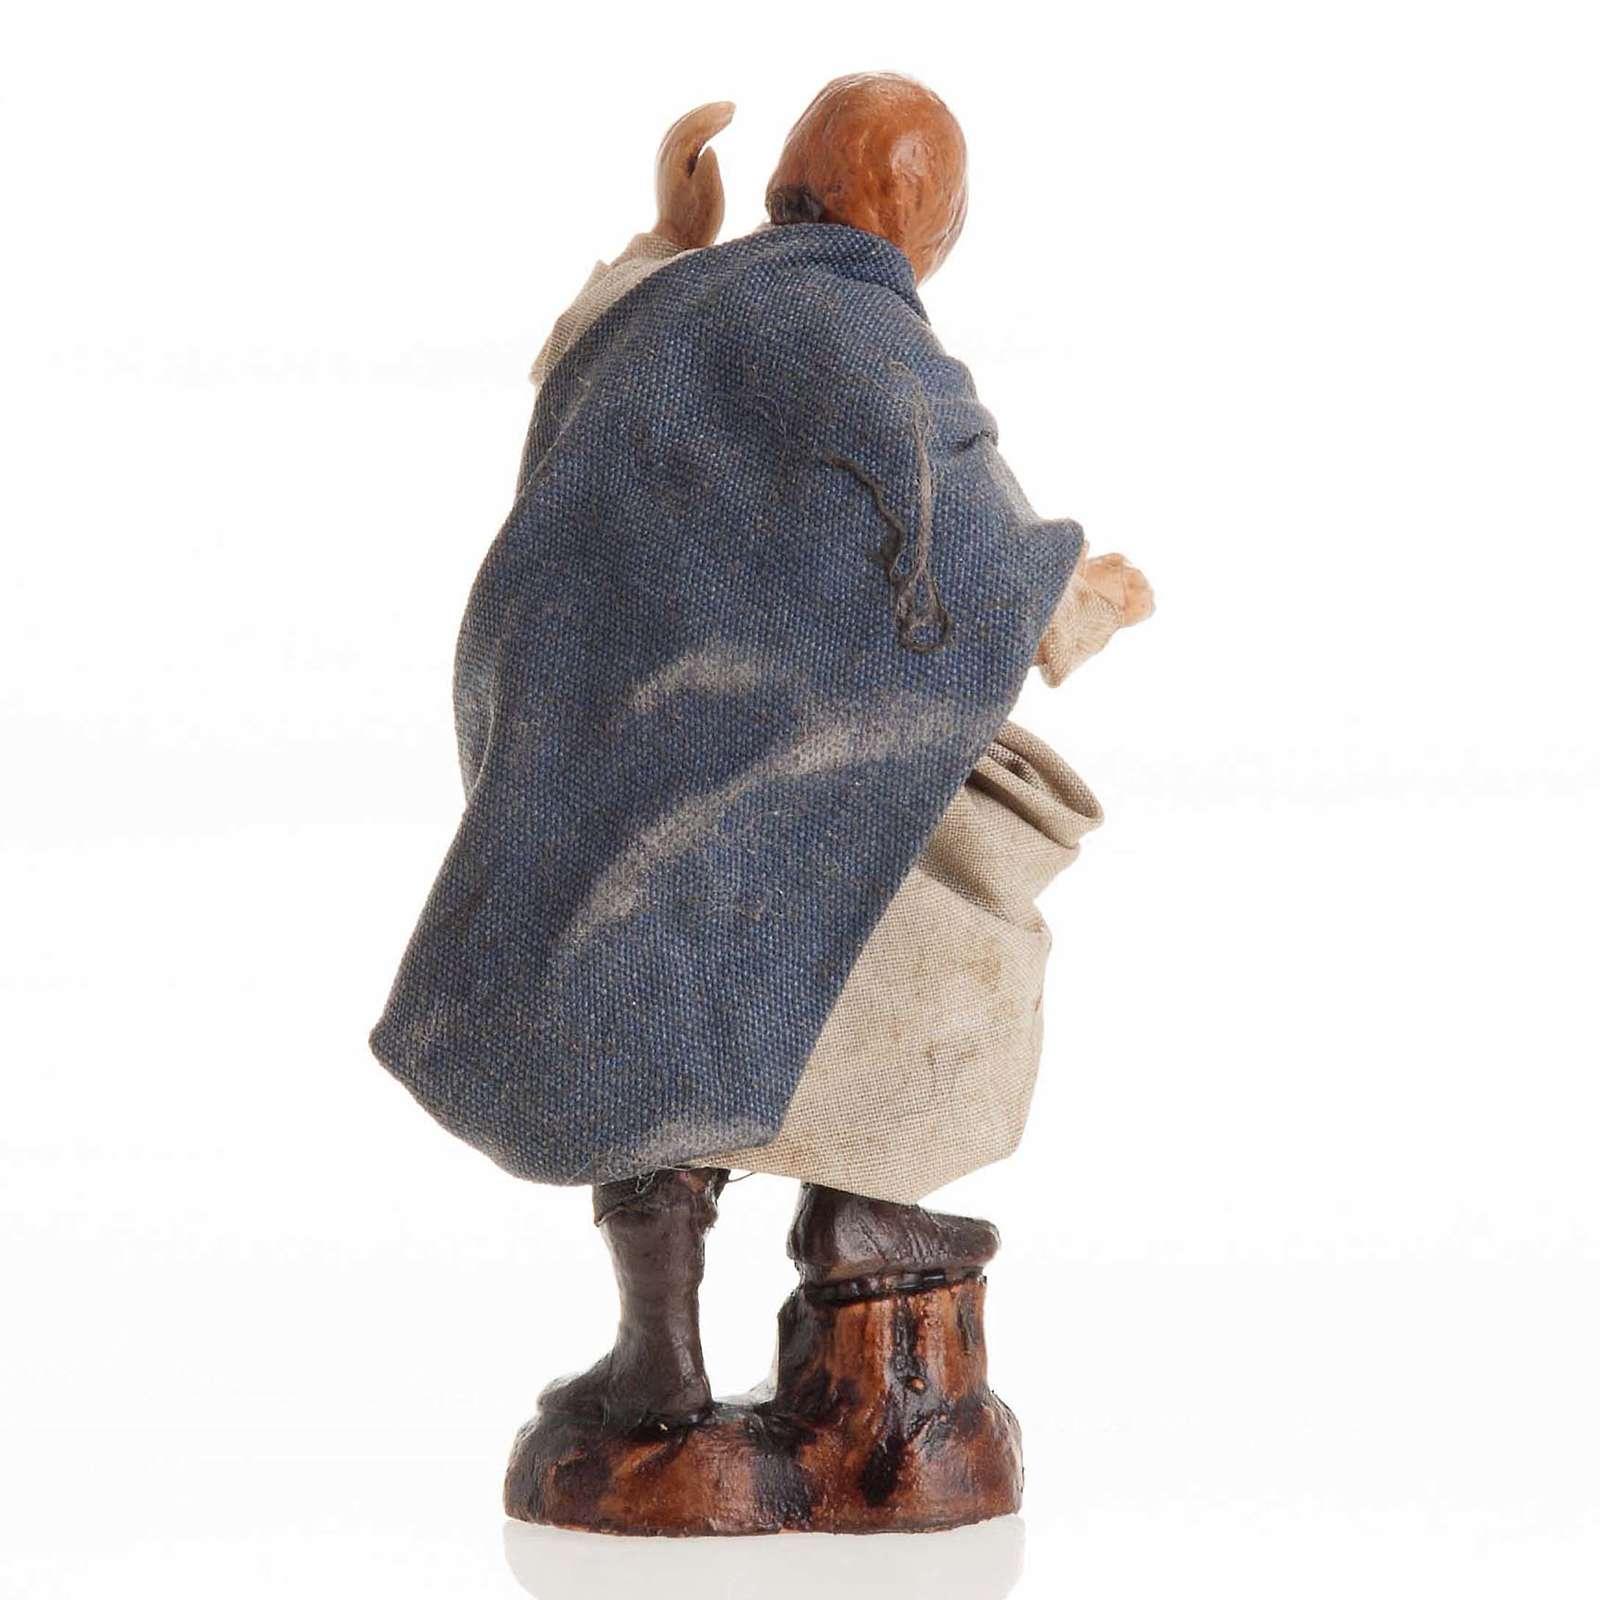 Neapolitan Nativity figurine, Young man 8cm 4